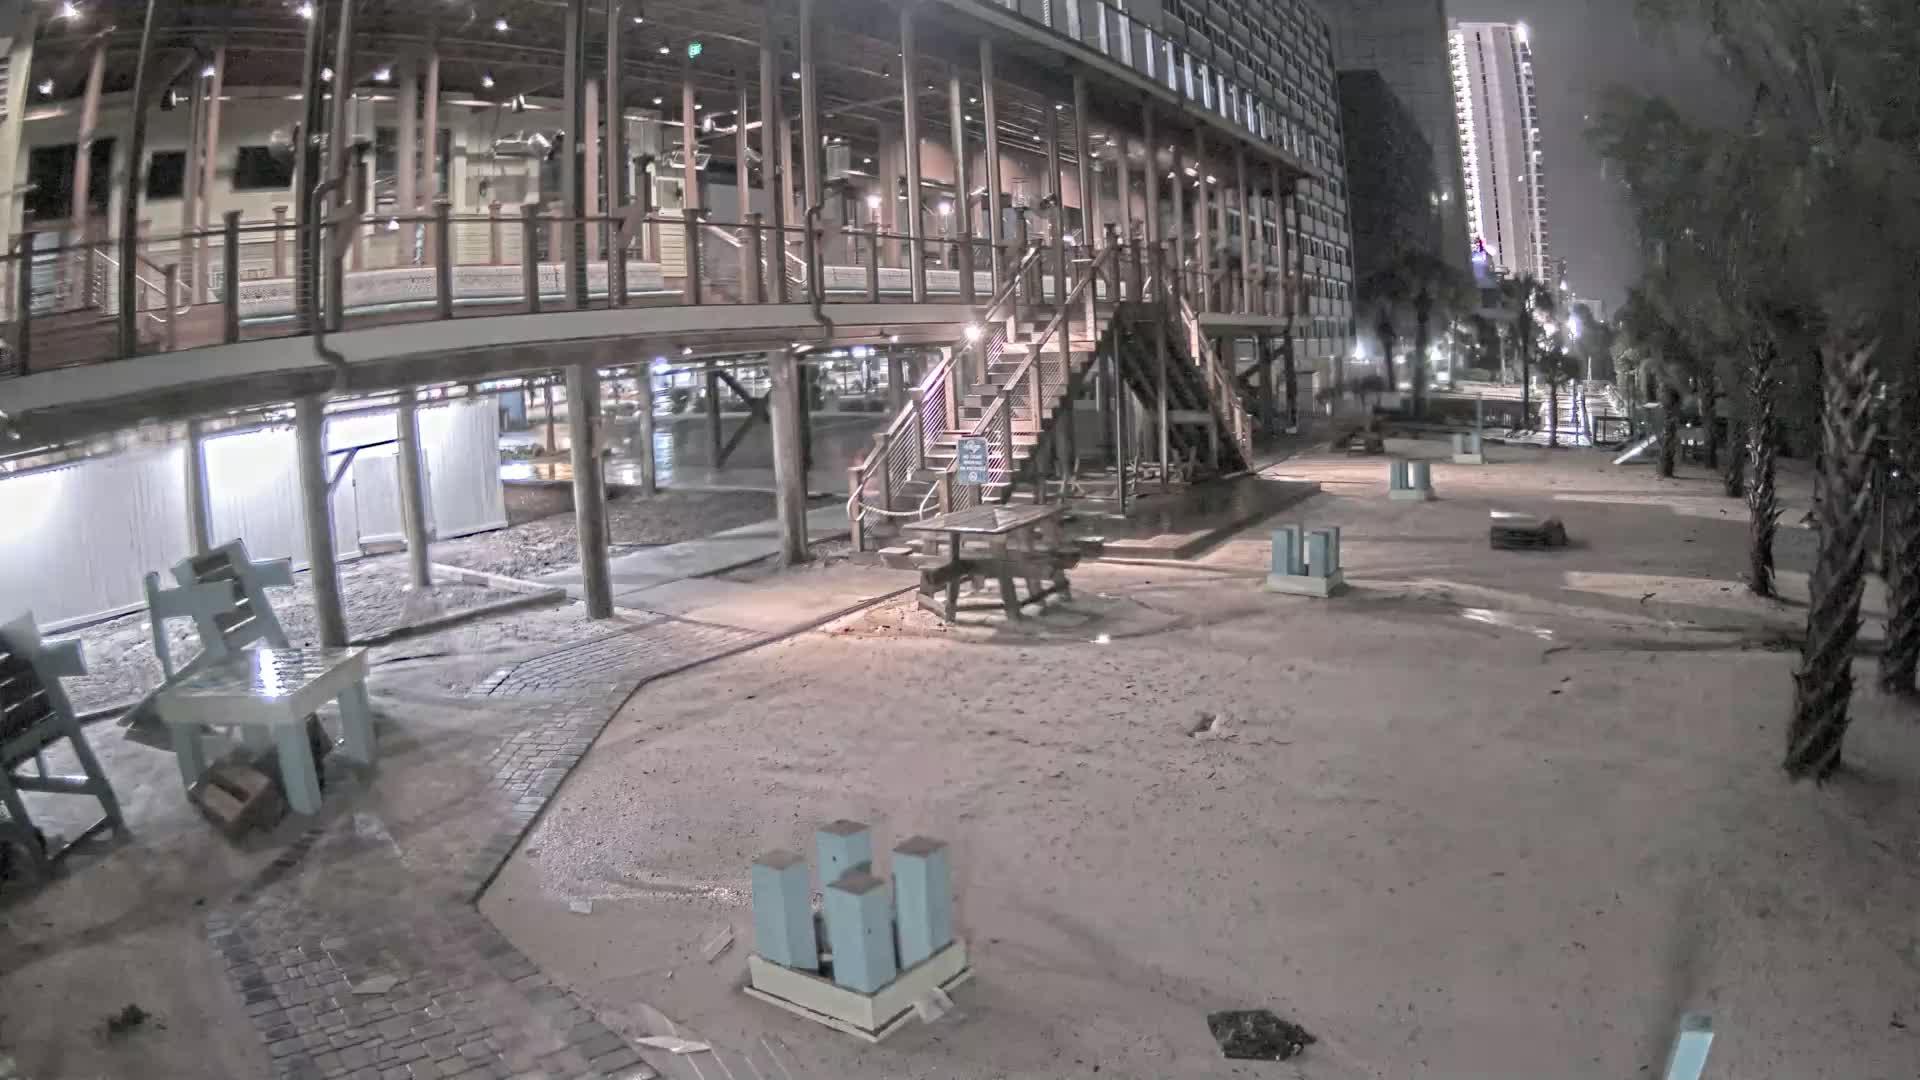 Riptydz Myrtle Beach Webcam 2 Recording for Dorian Approach (2019)